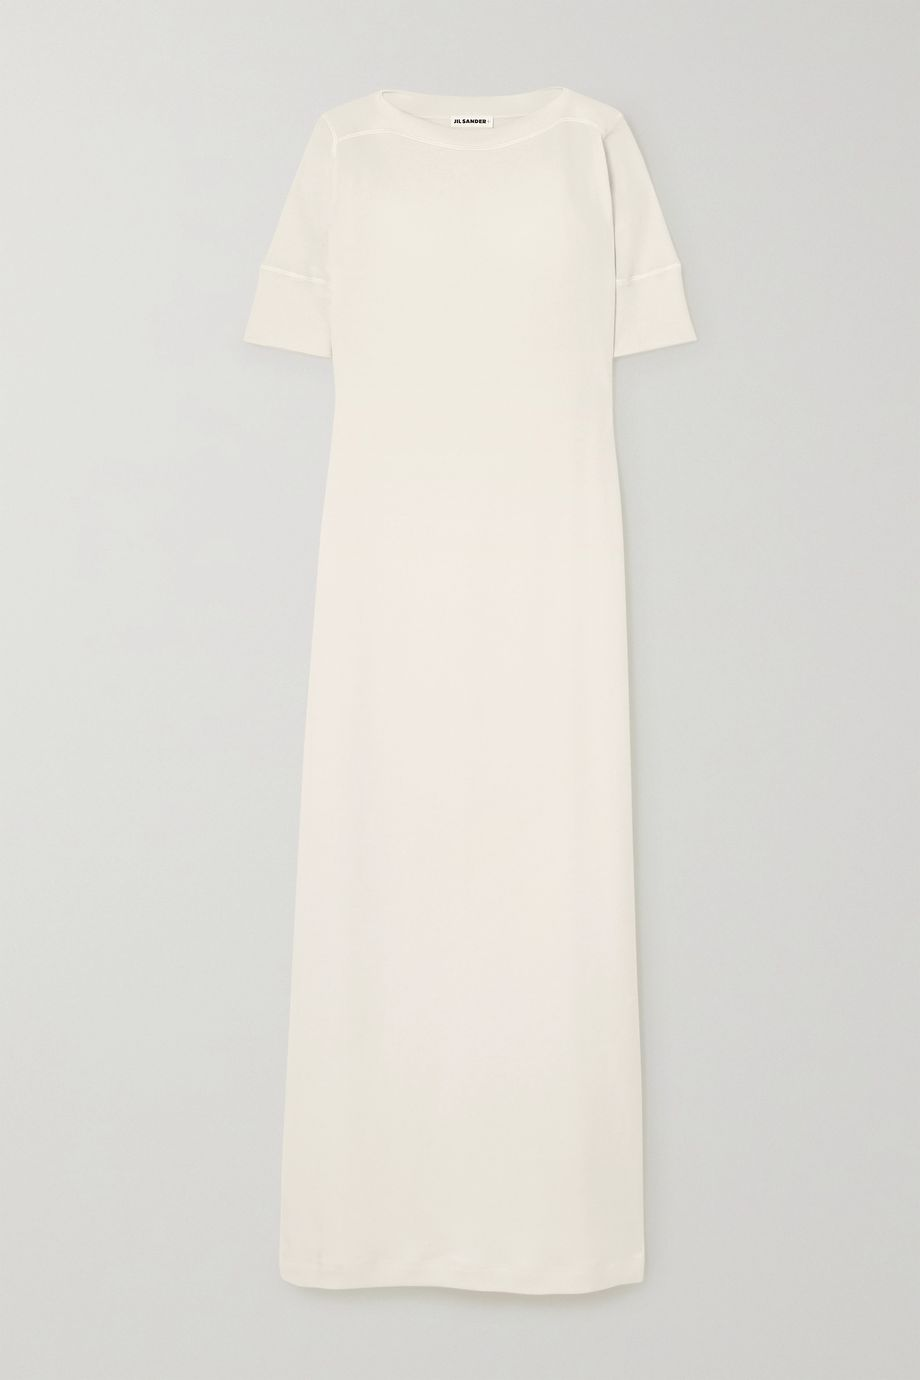 Jil Sander Cotton-jersey maxi dress